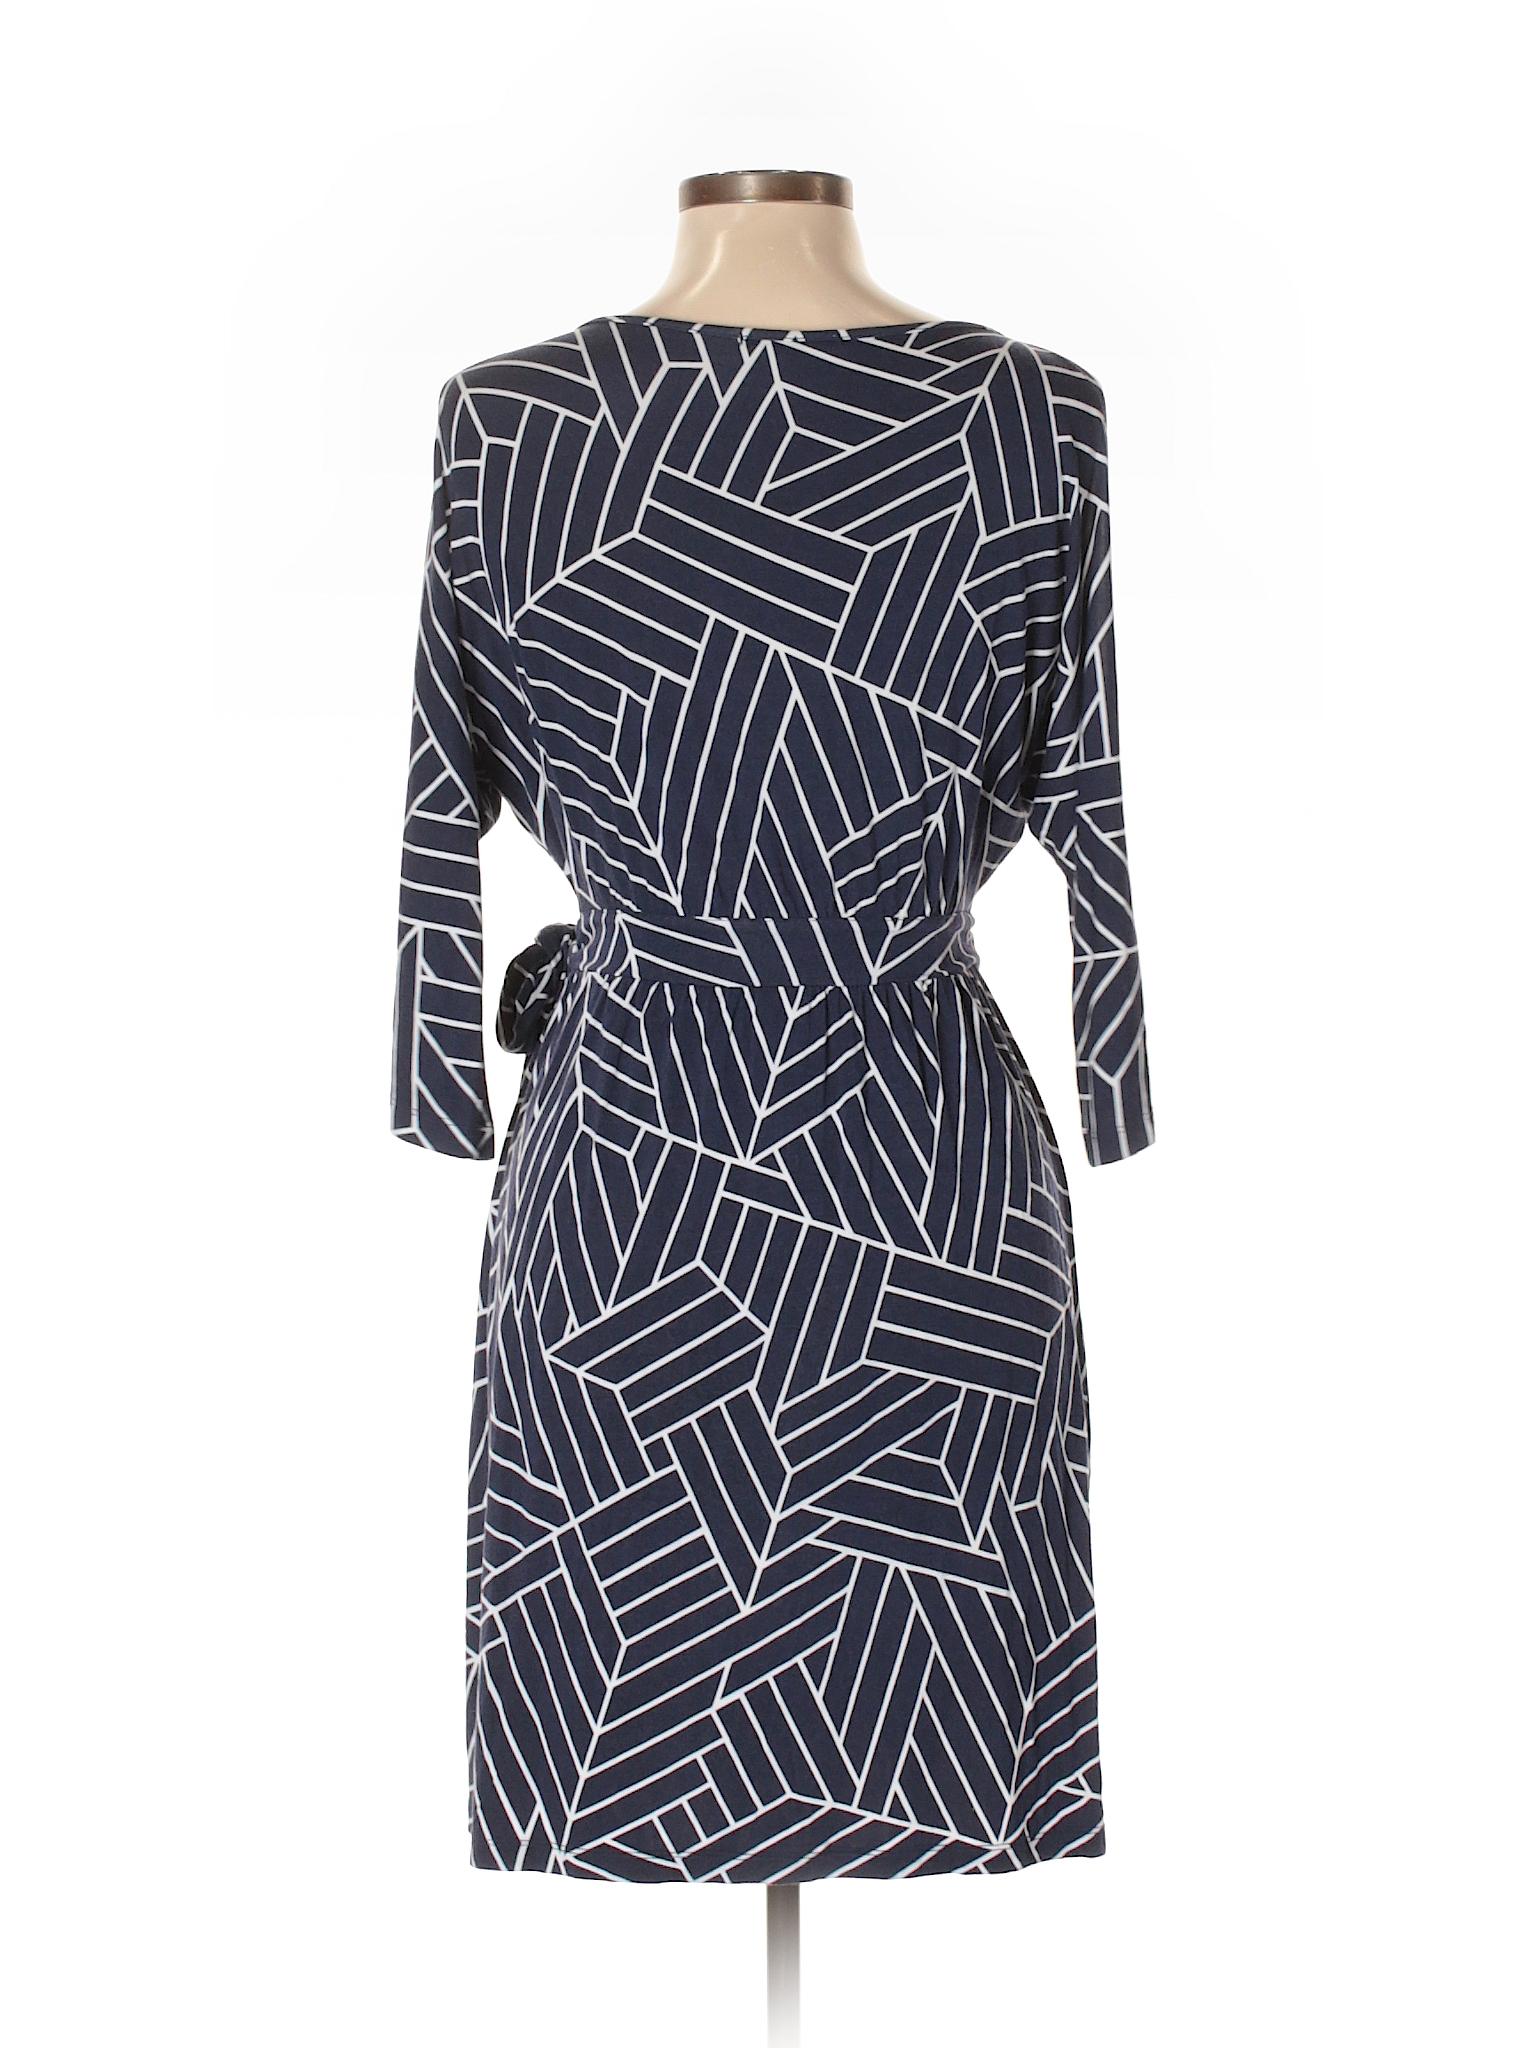 Casual Tart winter Boutique winter Boutique Dress YtBIxf